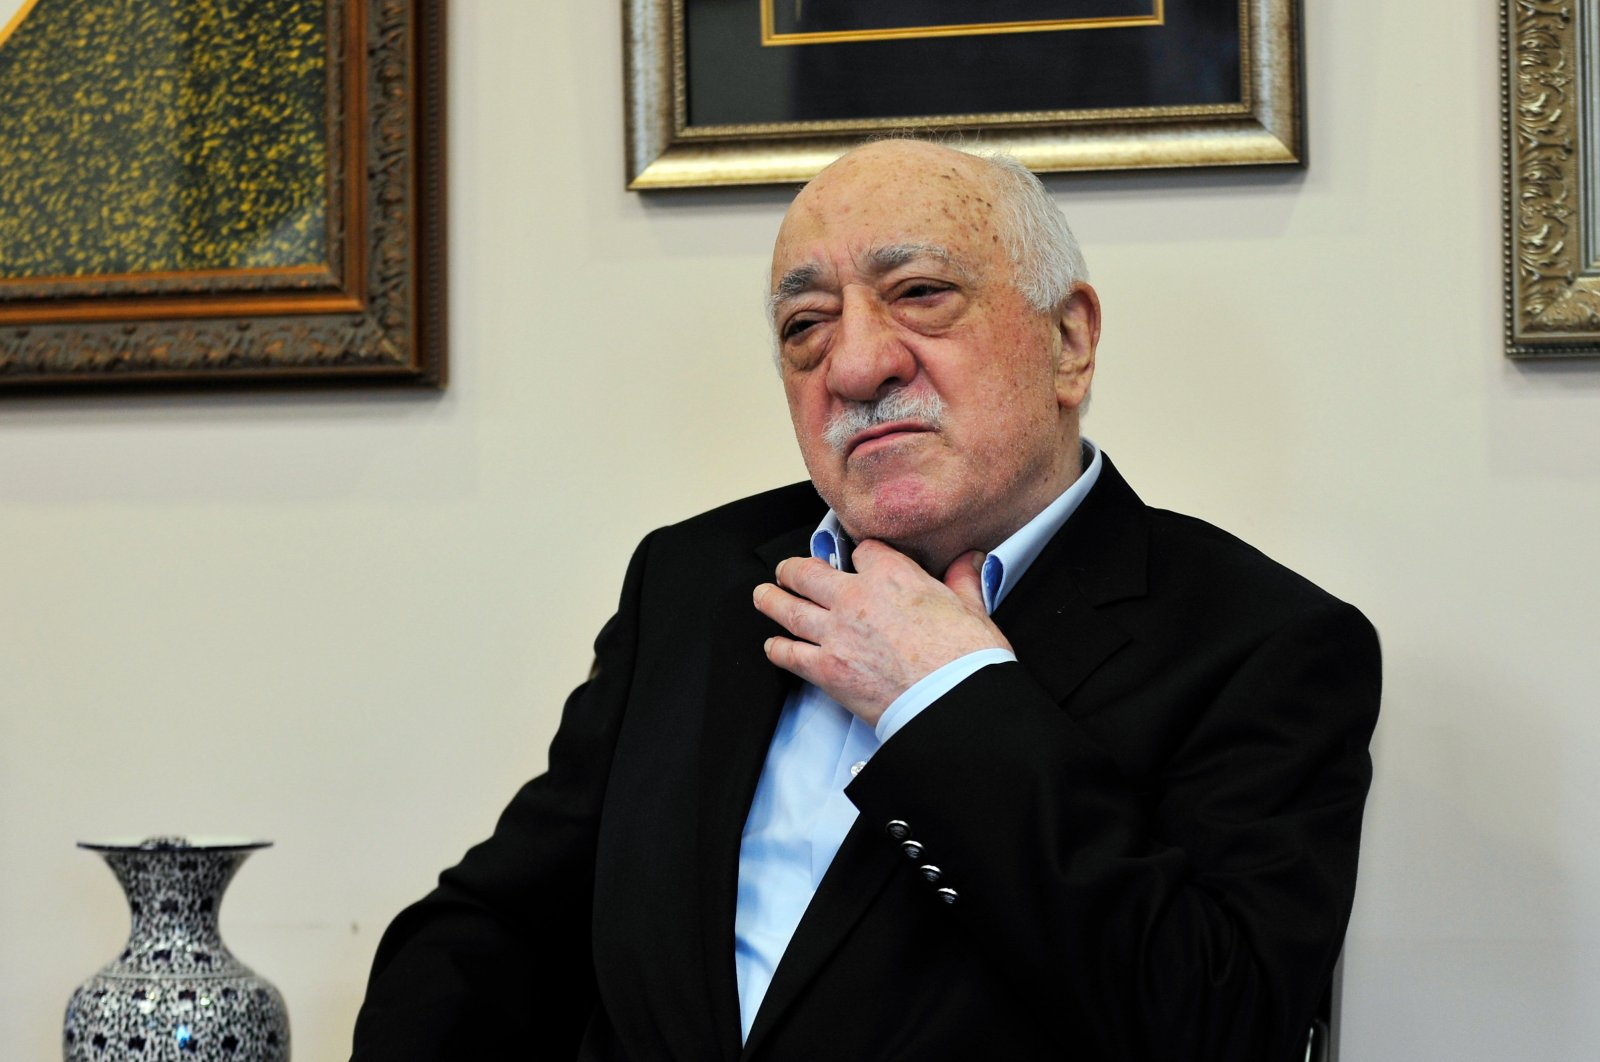 FETÖ leader Fetullah Gülen is among the culprits of the July 15, 2016 coup attempt. (AP Photo)